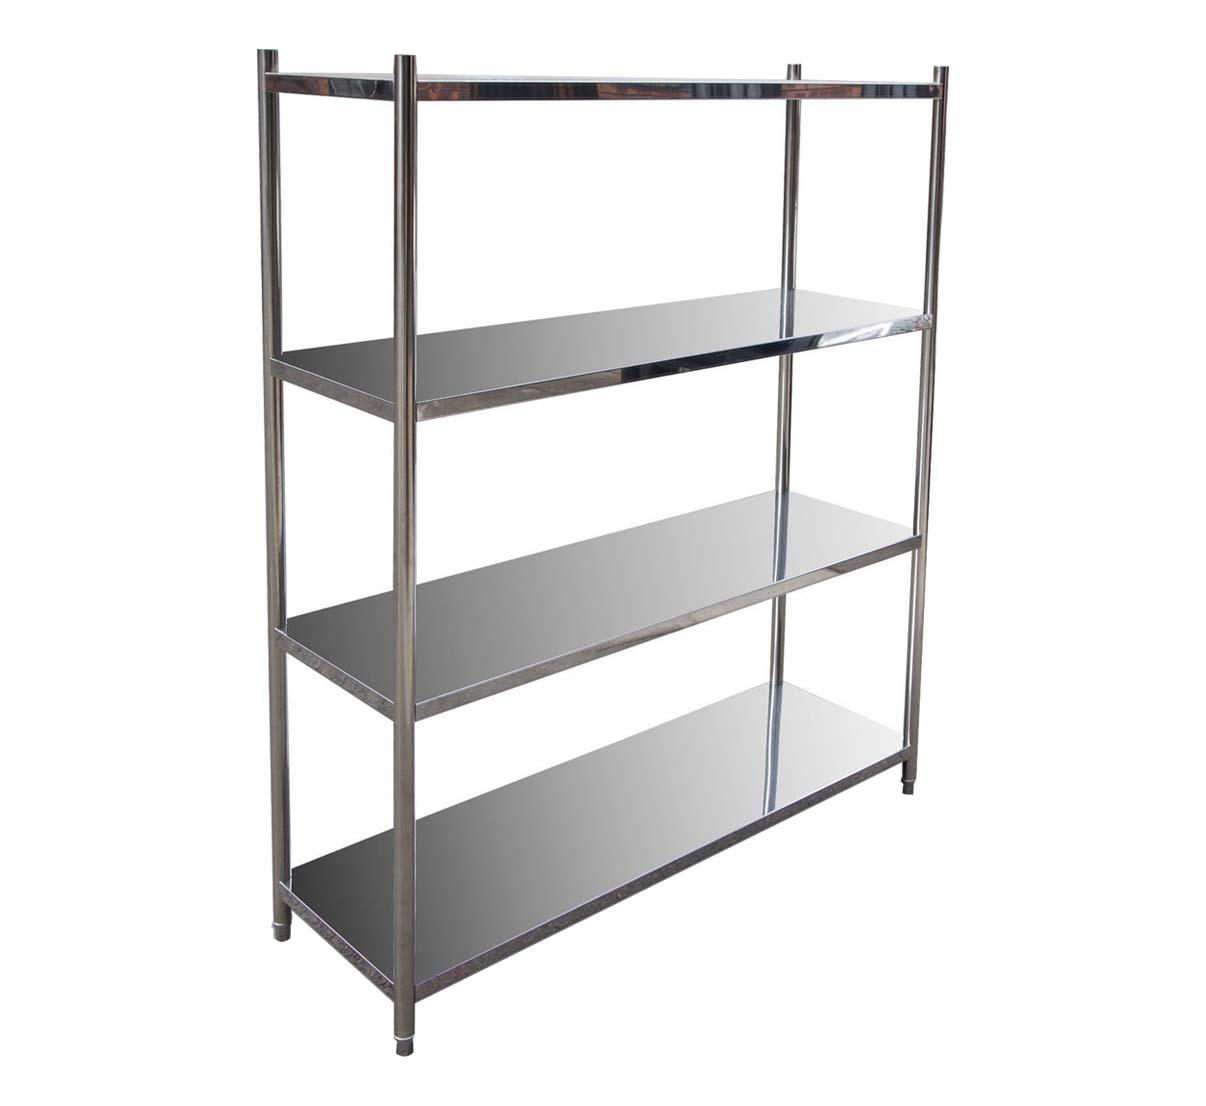 Jual Rak Dapur Stainless Steel